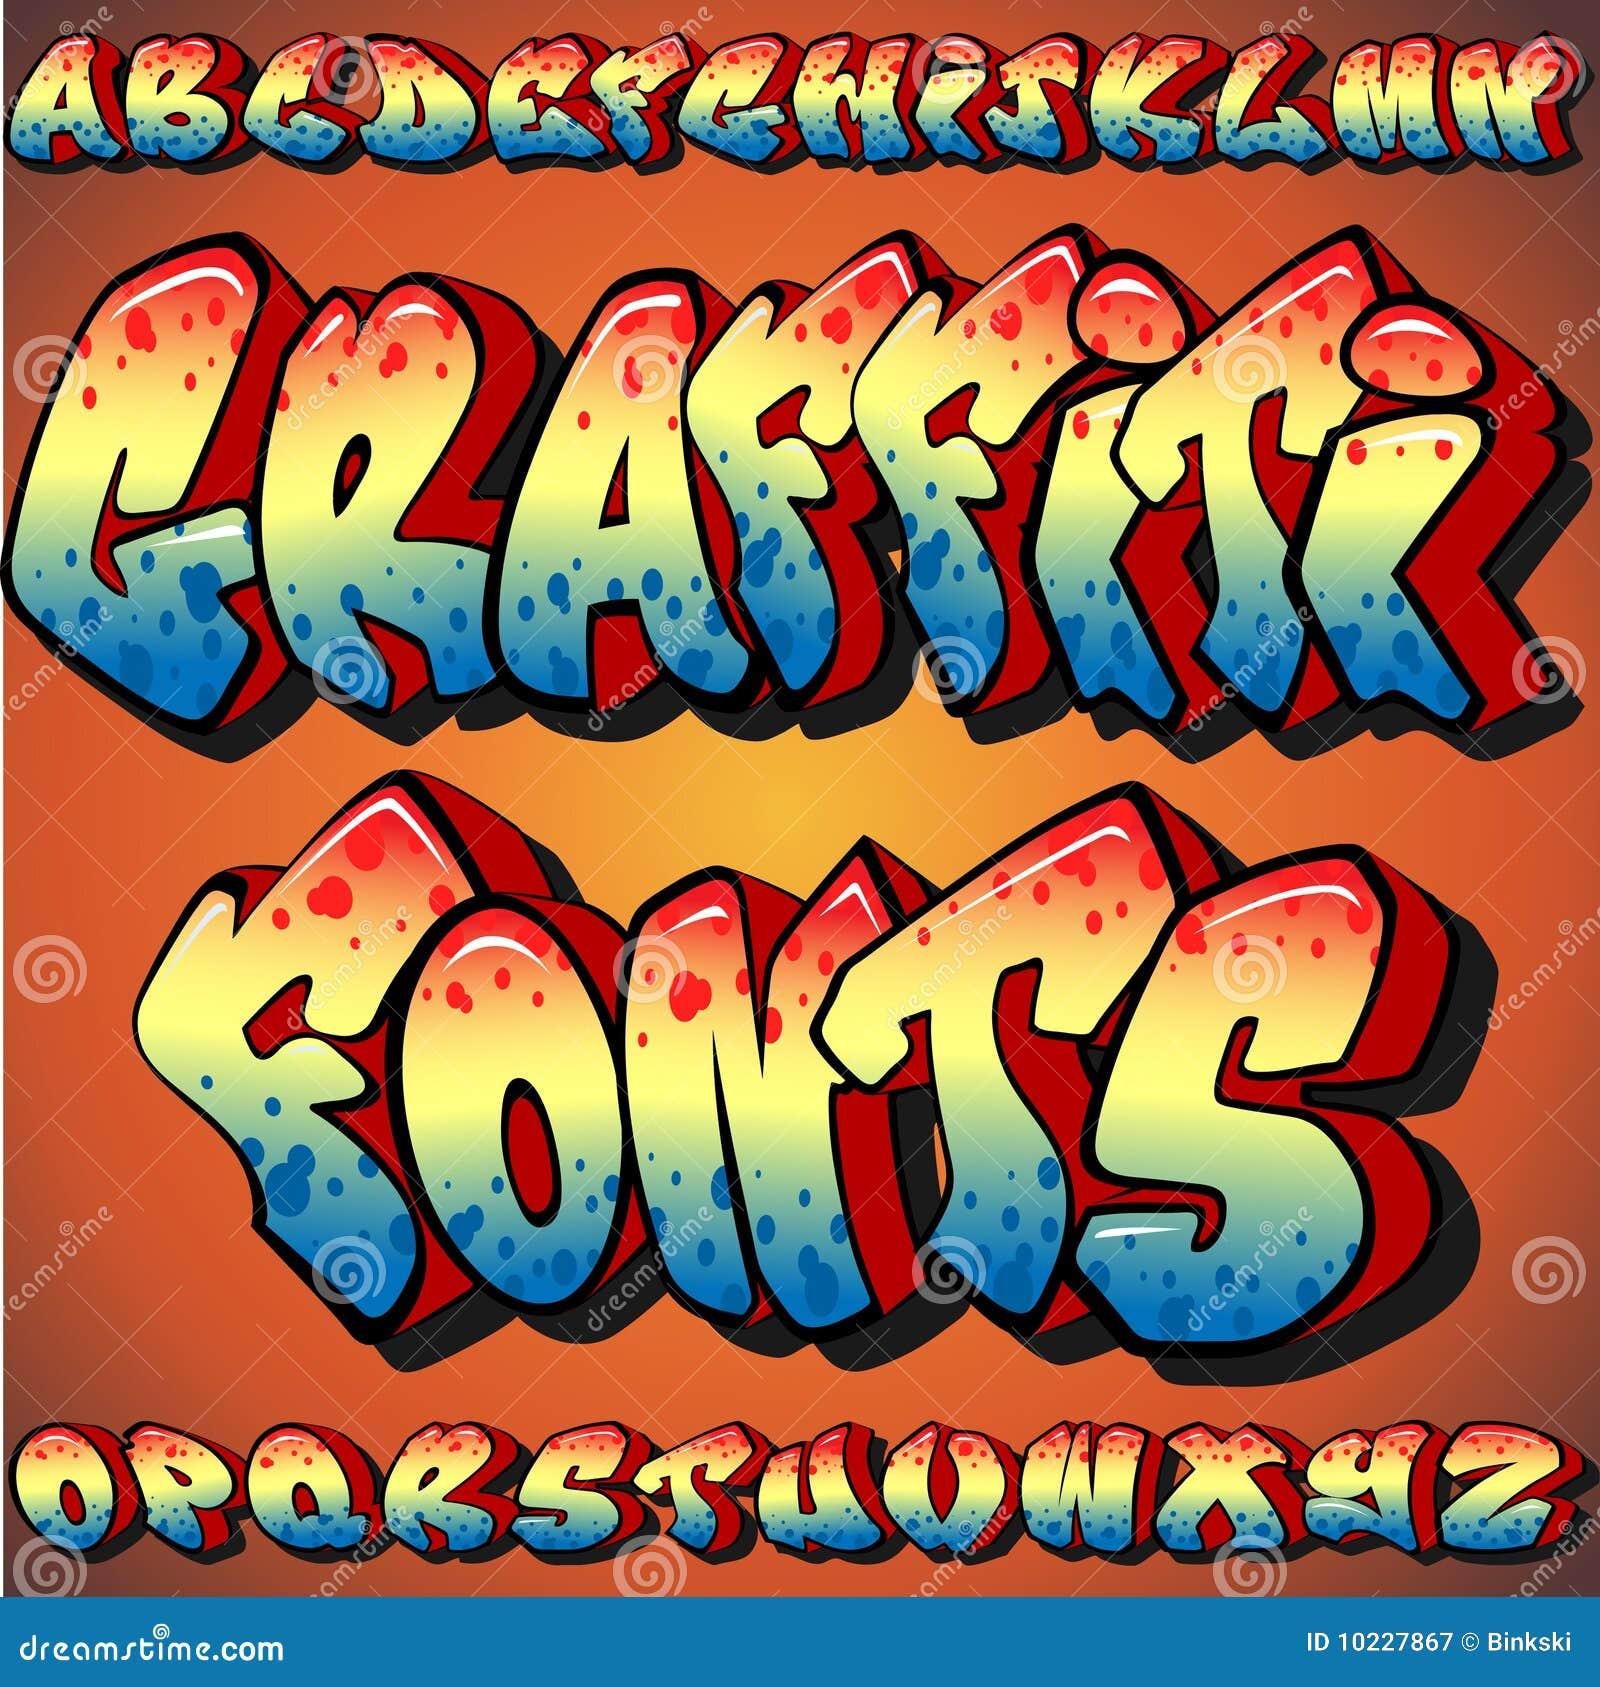 Graffiti fonts graffiti fonts royalty free stock photography image 10227867